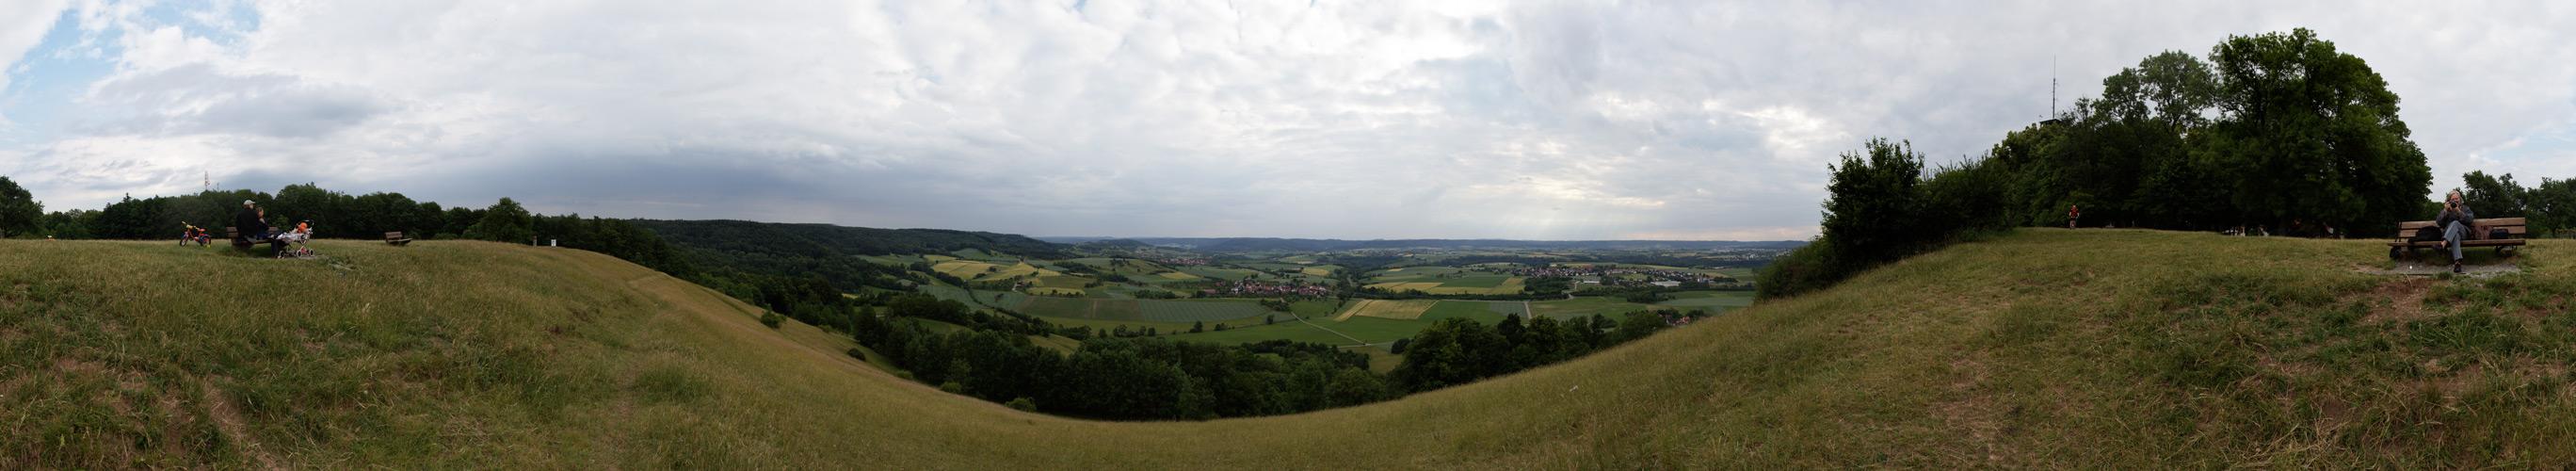 Einkorn Panorama